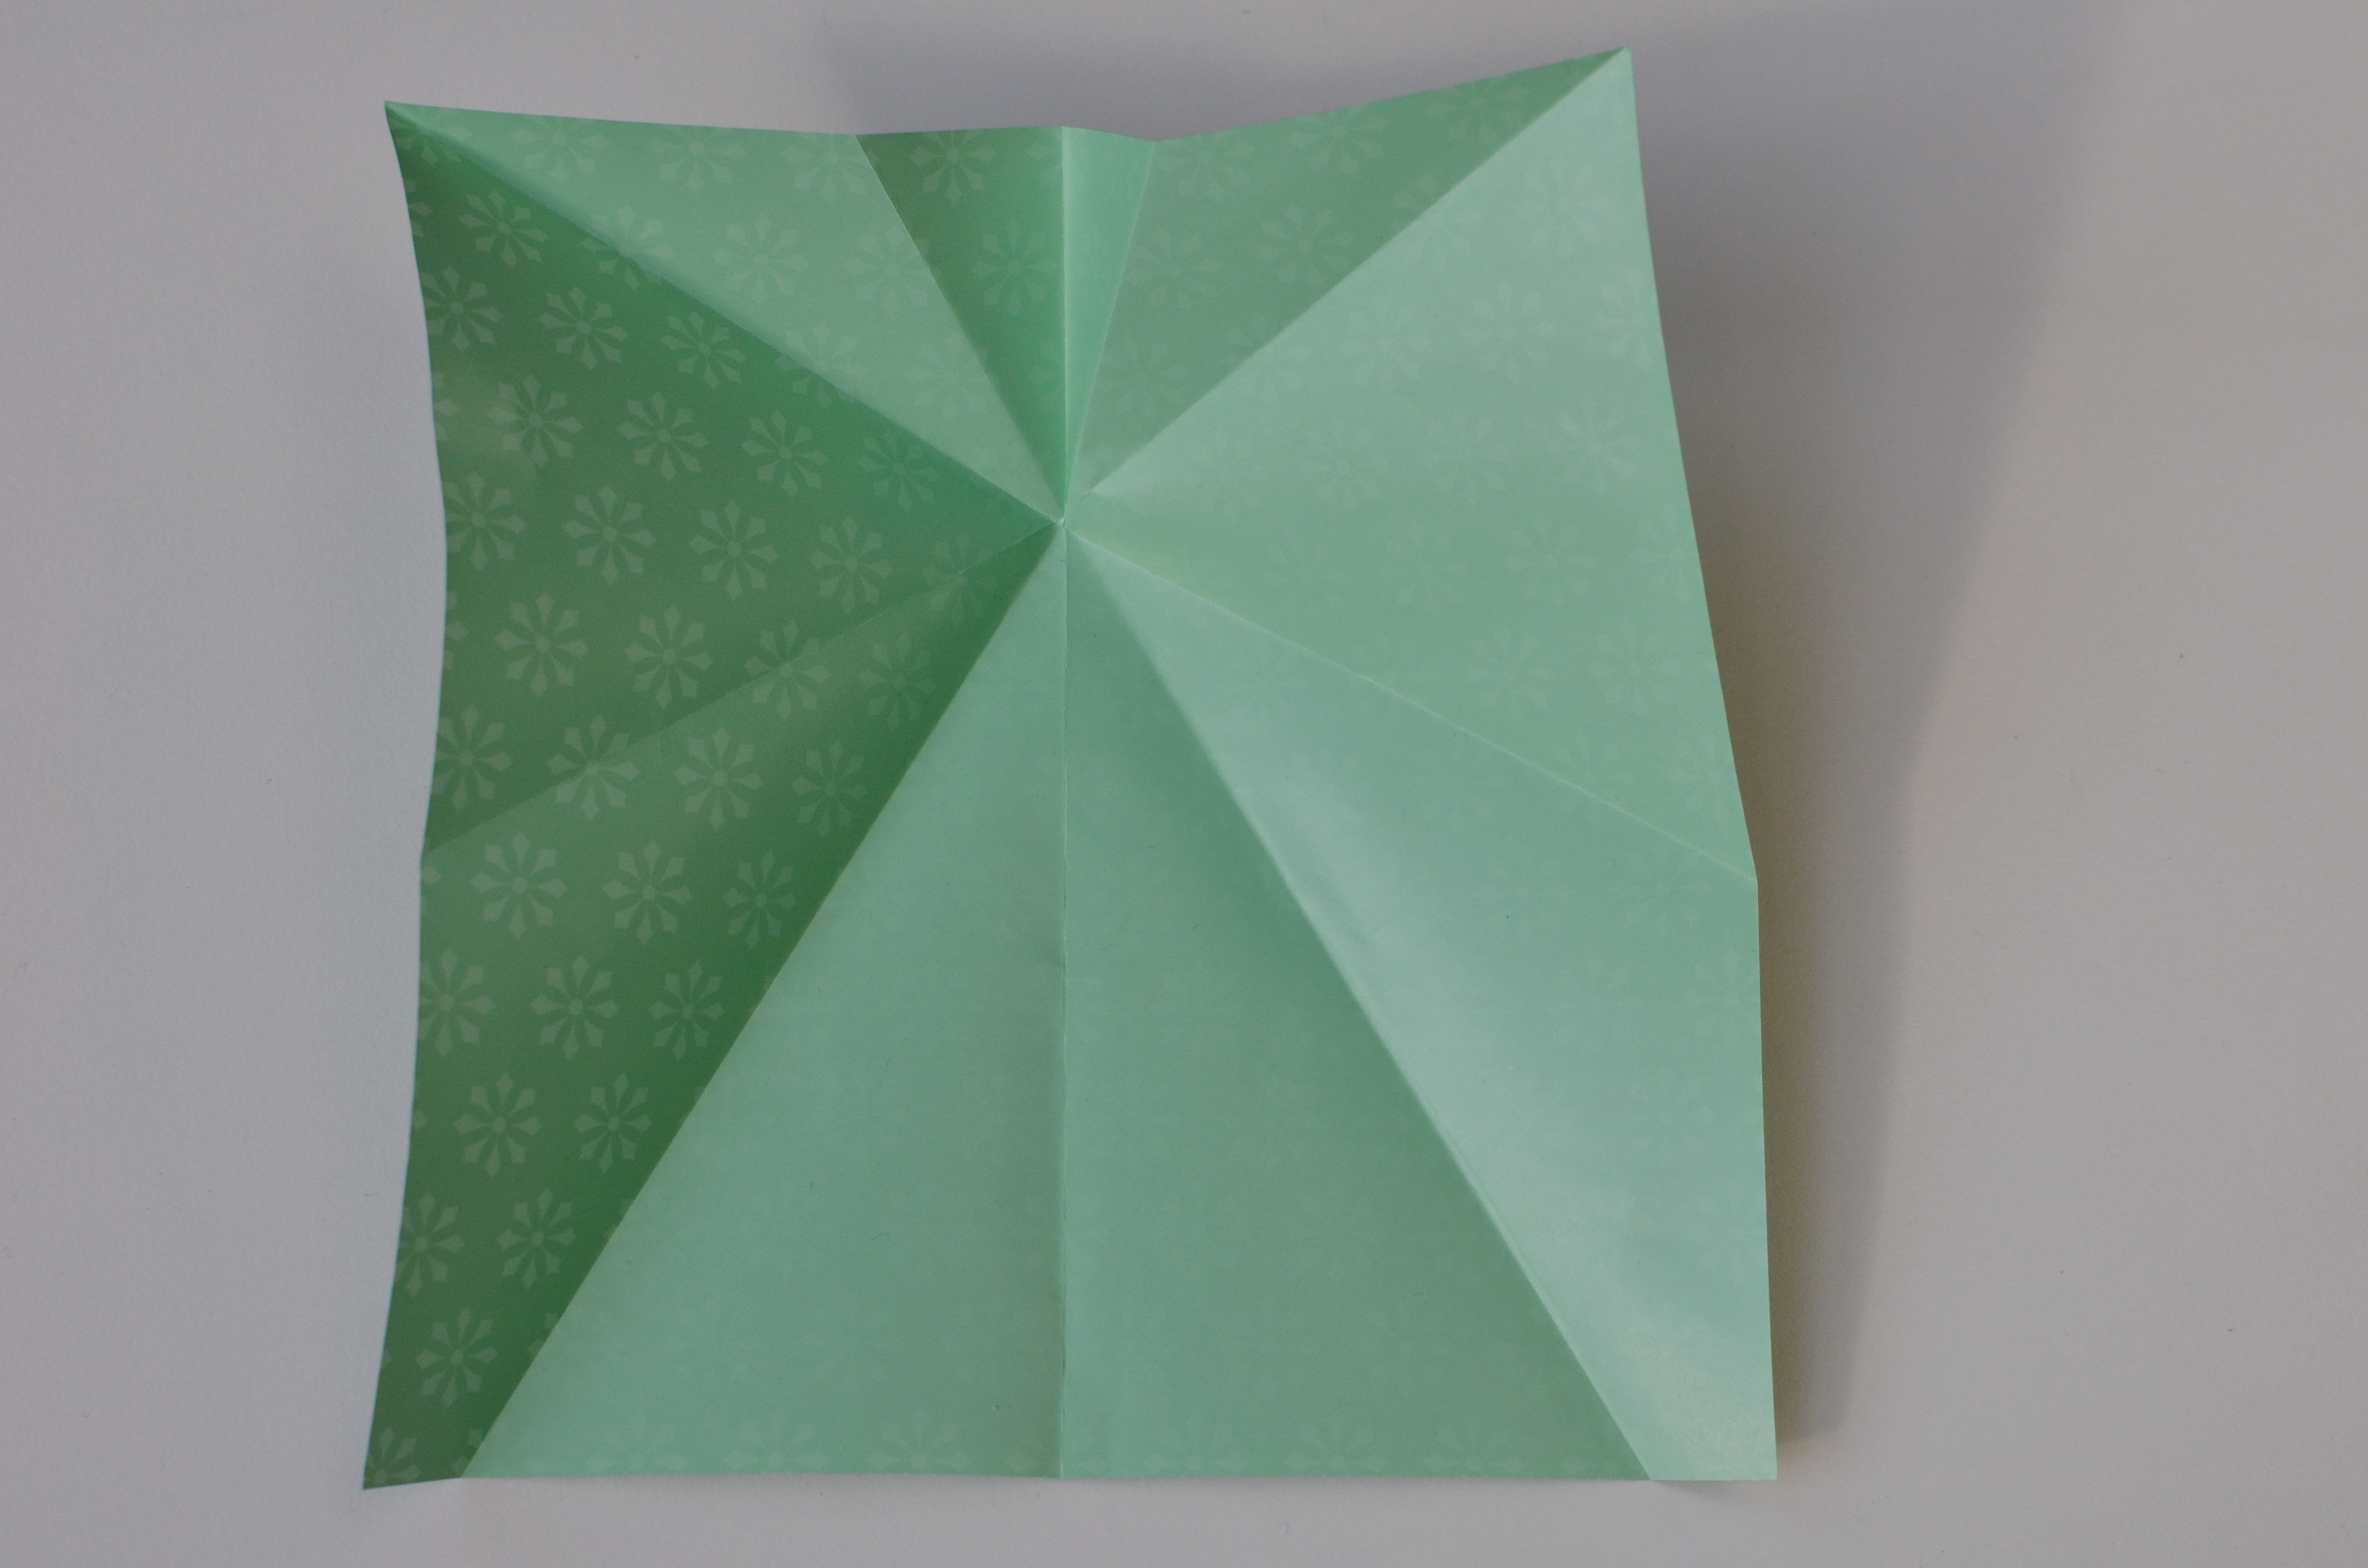 braincrafts_frog_origami_pt13.jpg